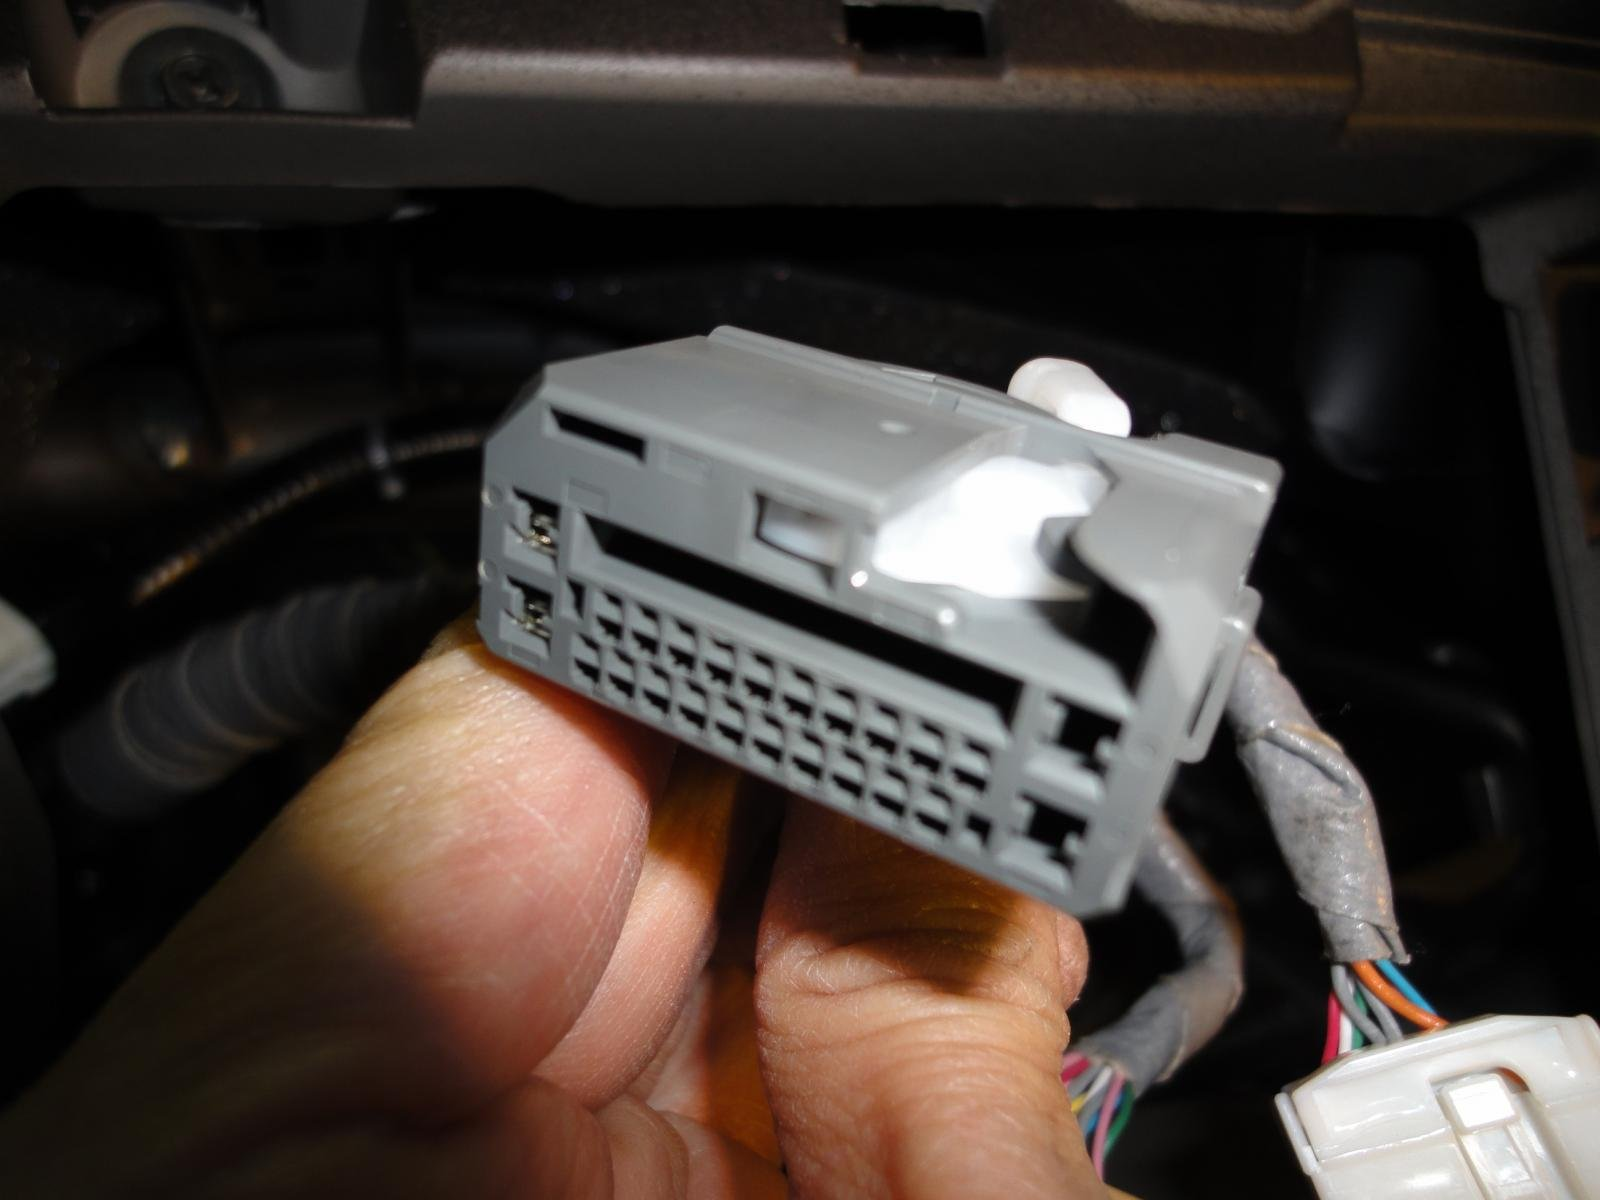 honda civic 2012 navigation wiring wiring schematic diagramhonda civic 2012 navigation wiring wiring diagram 2014 honda civic navigation system honda civic 2012 navigation